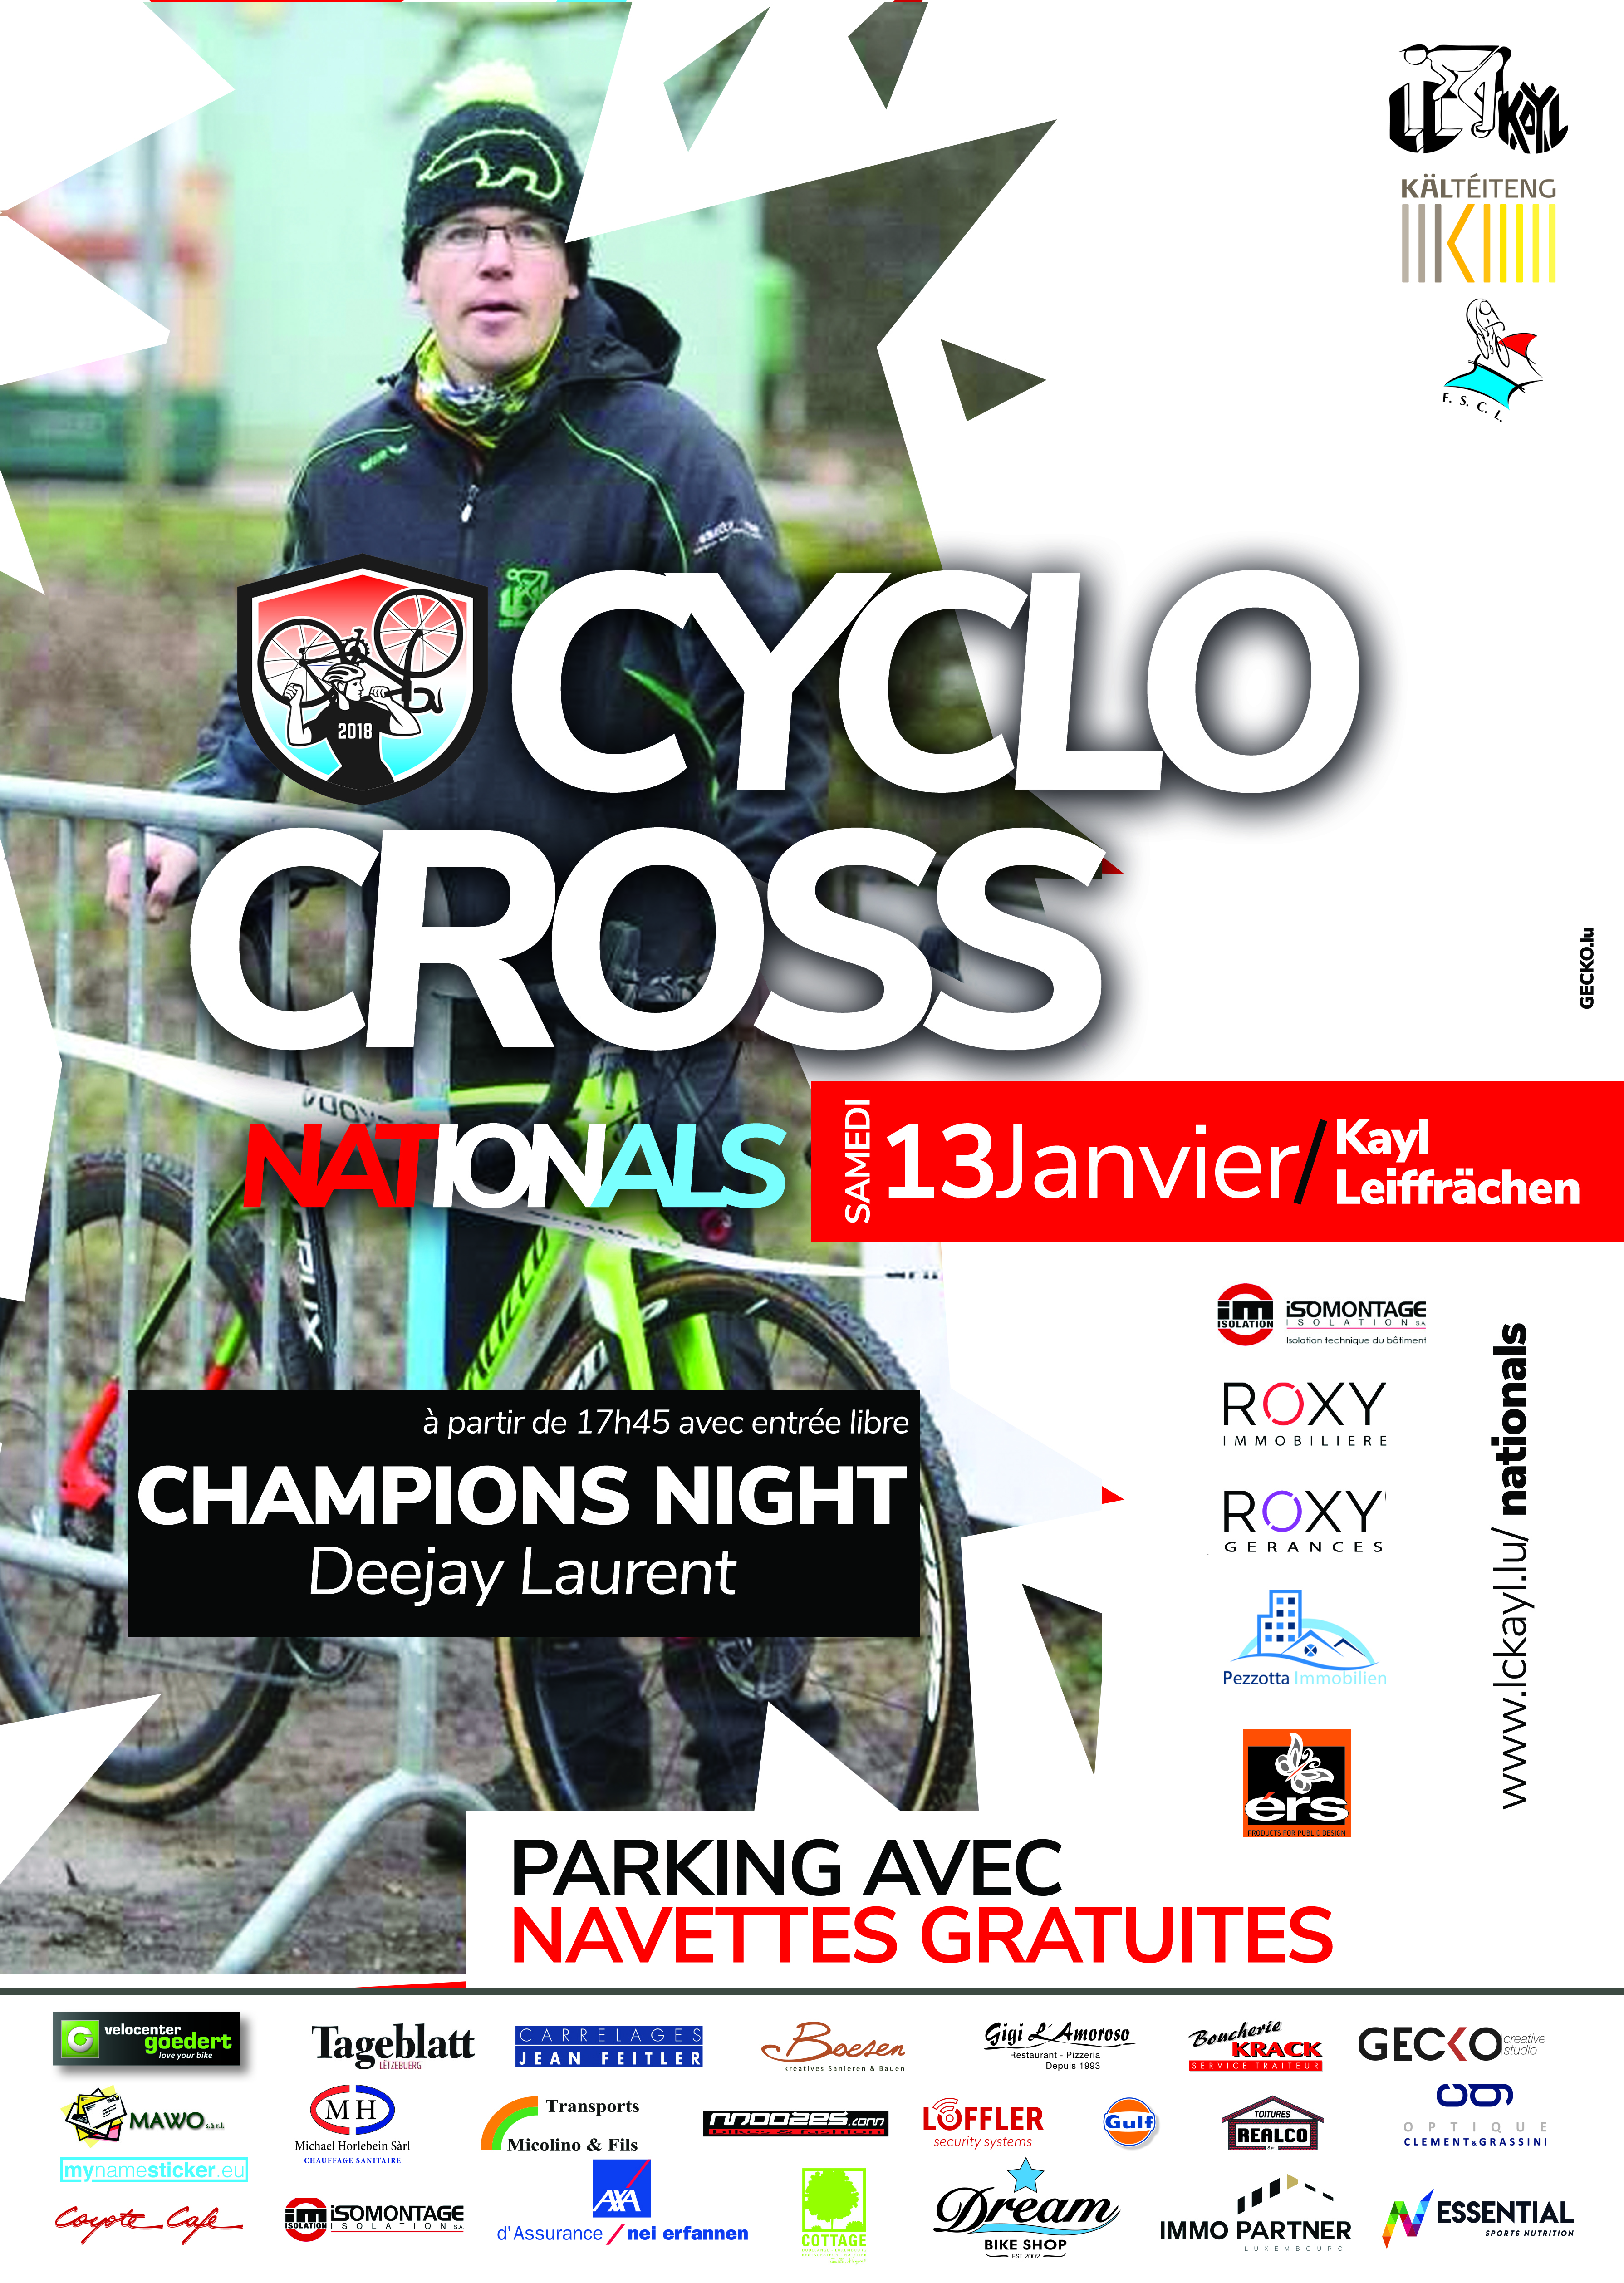 Championnats Nationaux Cyclo Cross le samedi 13 janvier 2018 à Kayl